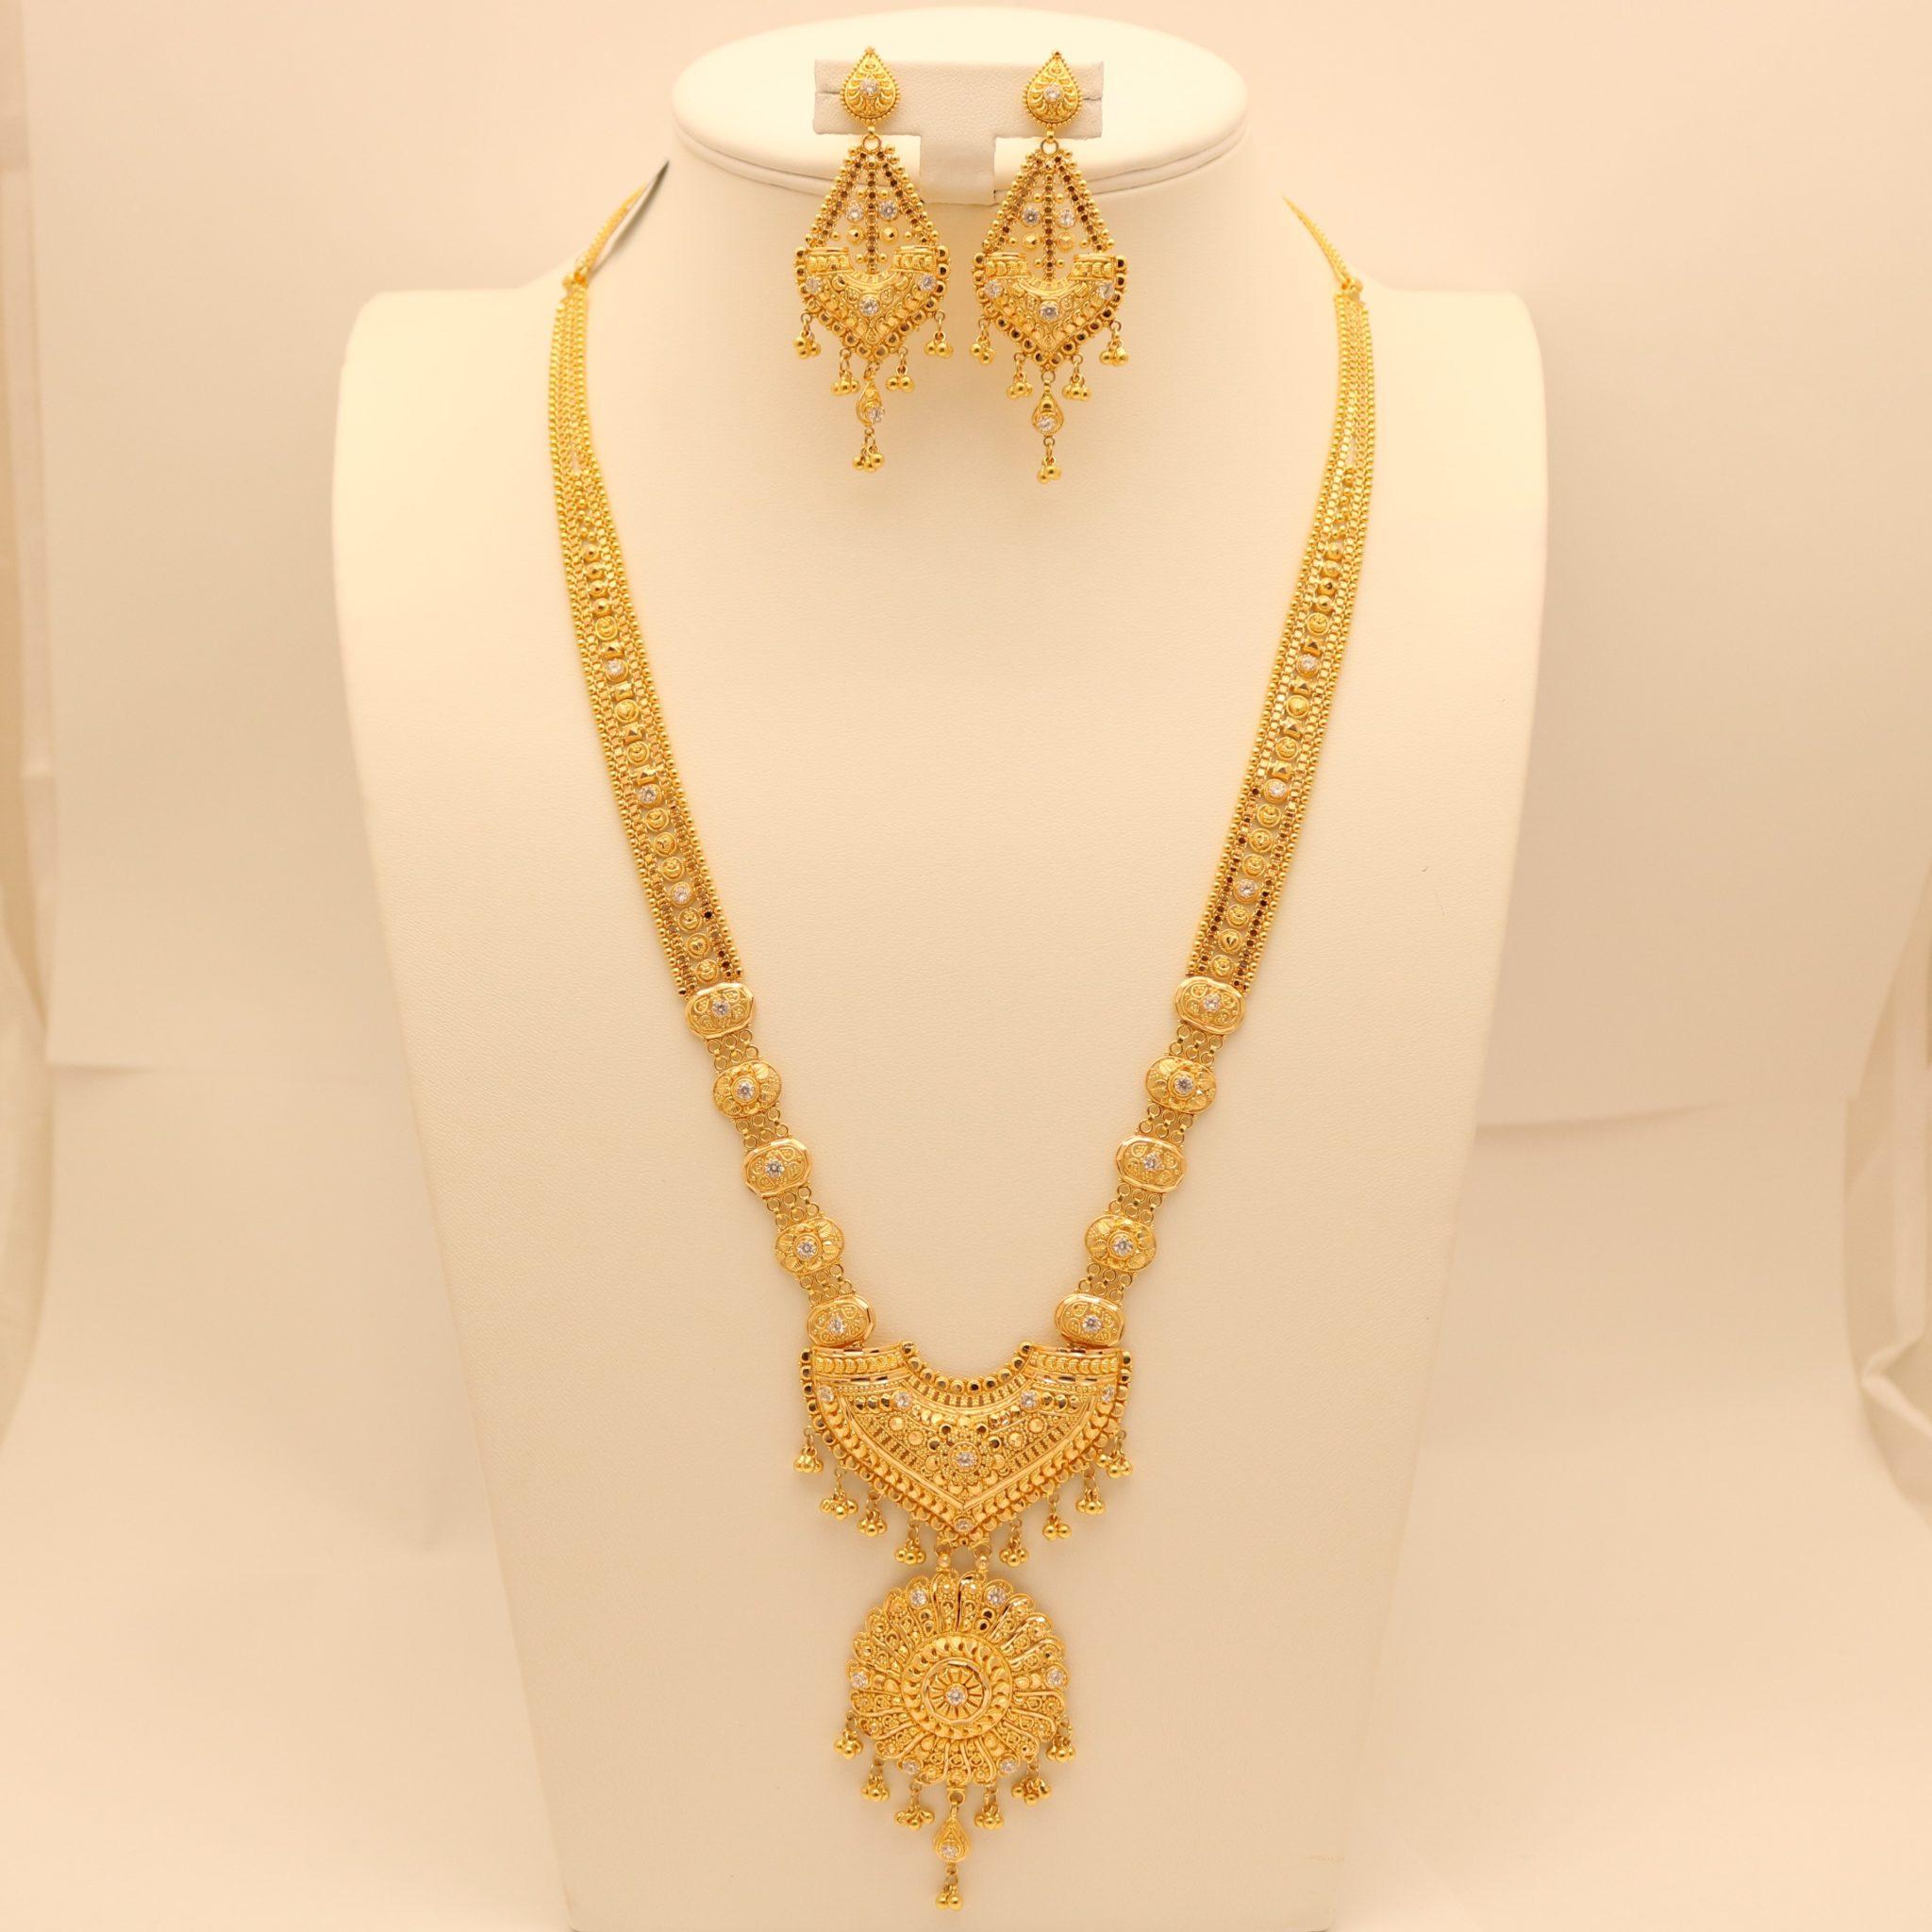 New 22 Carat Gold Jewellery Designs India | Jewellry\'s Website